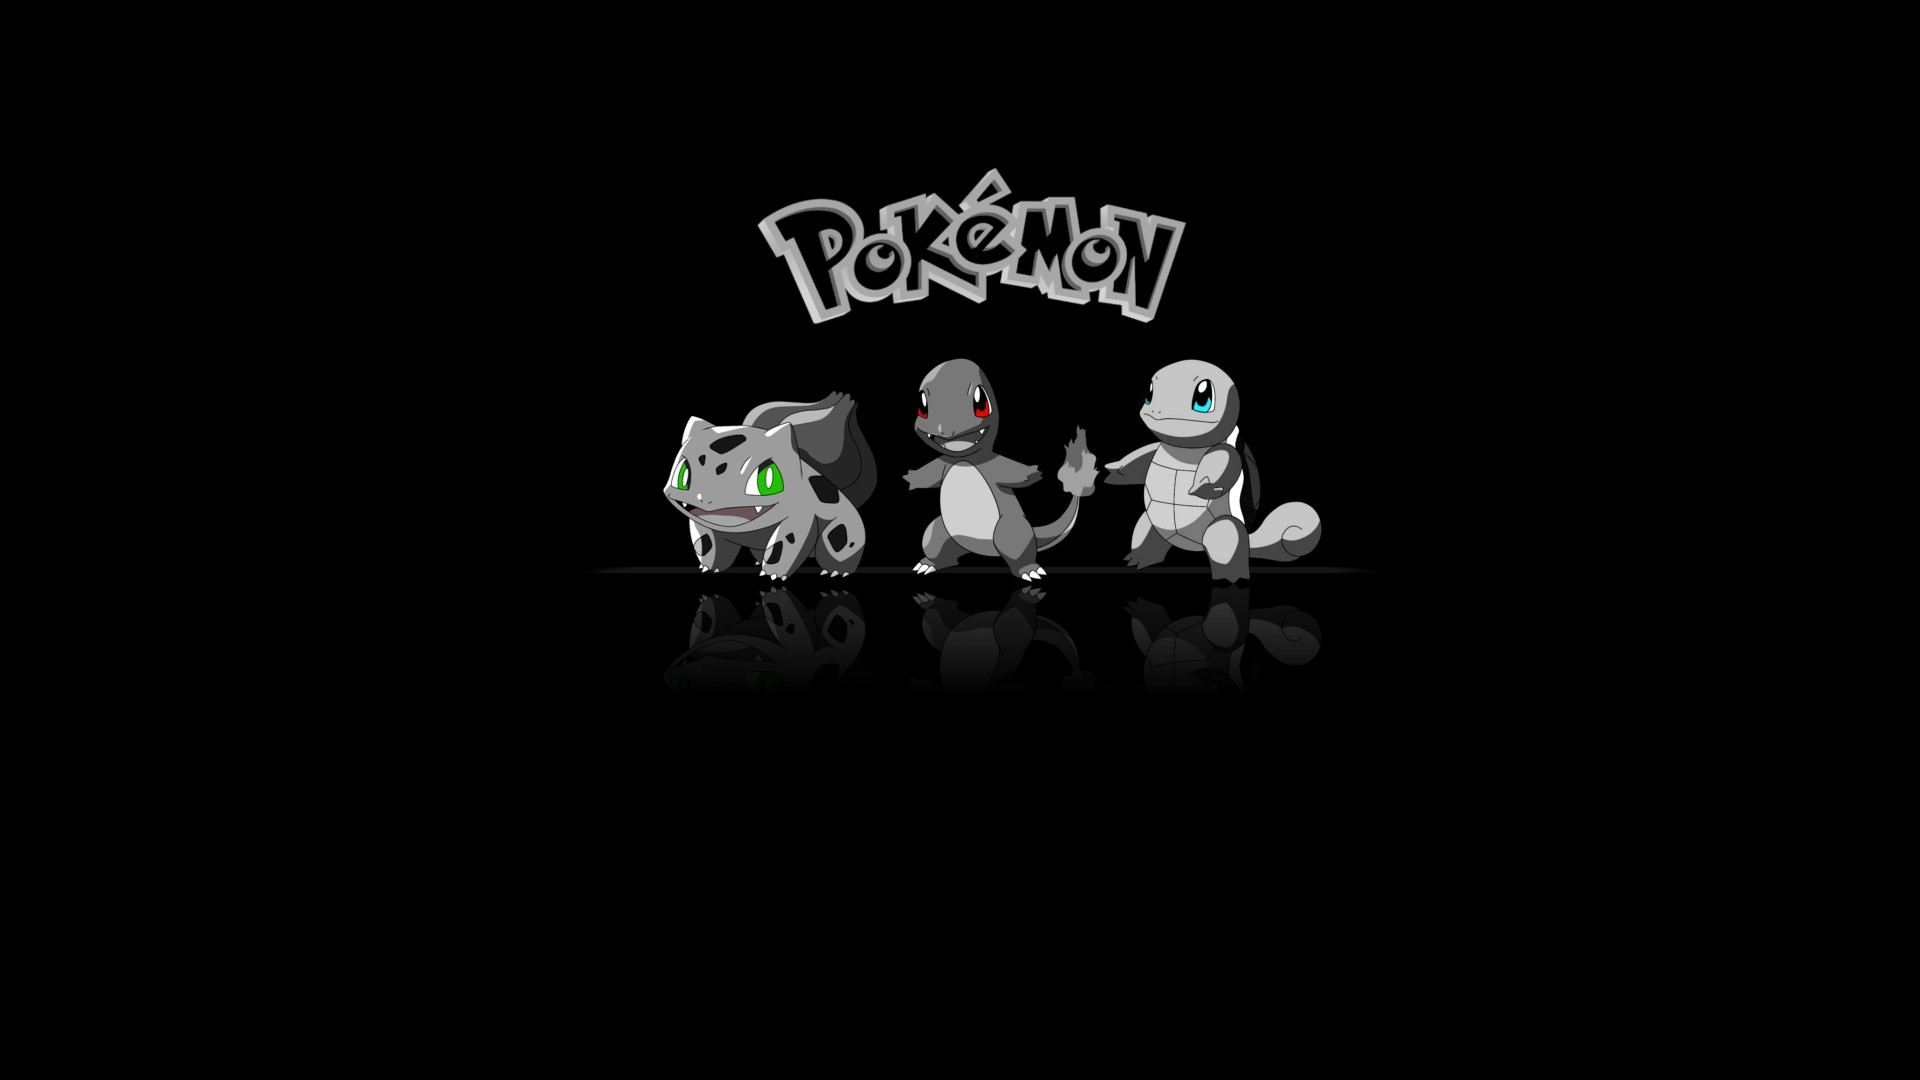 wallpapers free pokemon red version